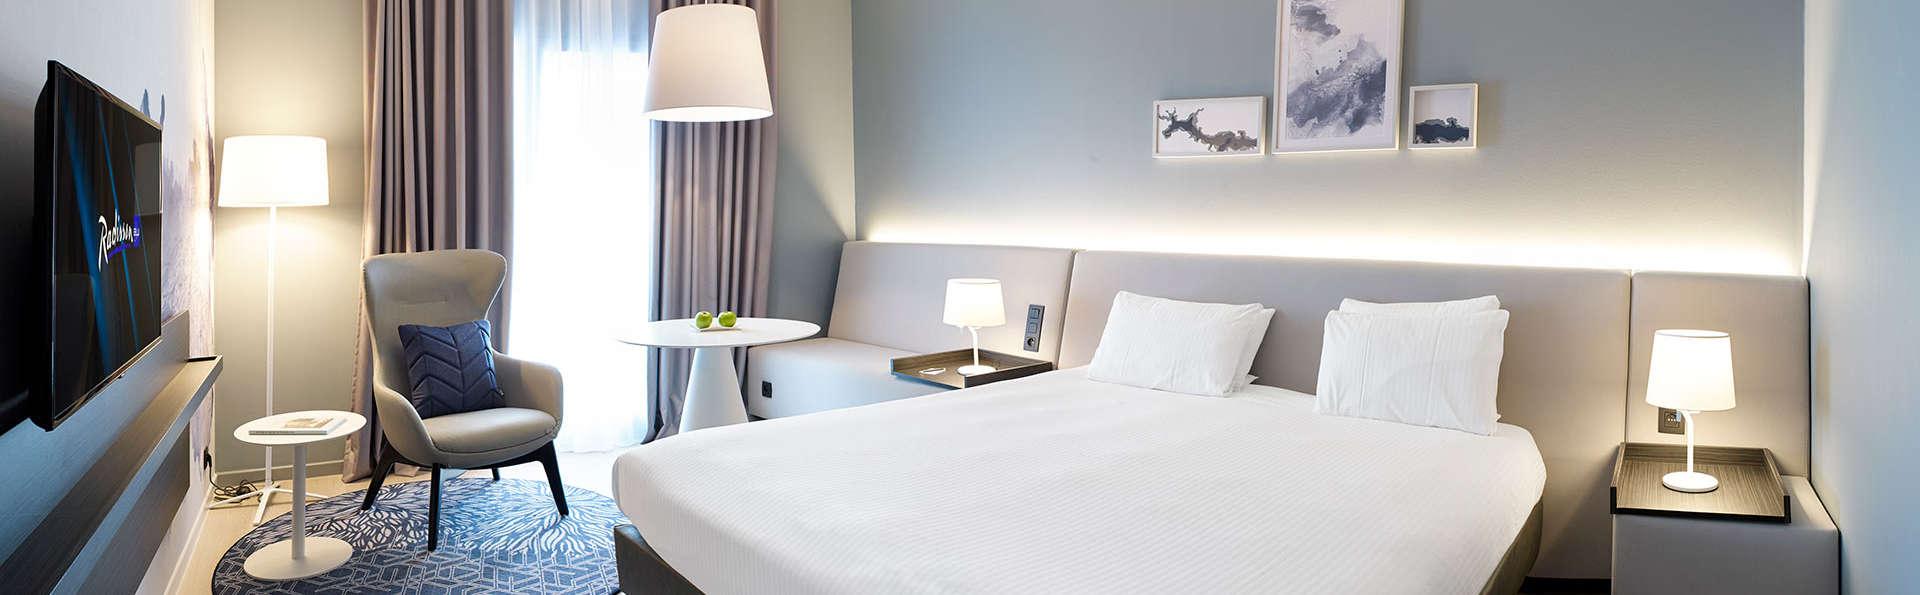 Radisson Blu Palace Hotel - EDIT_NEW_JUNIORSUITE.jpg